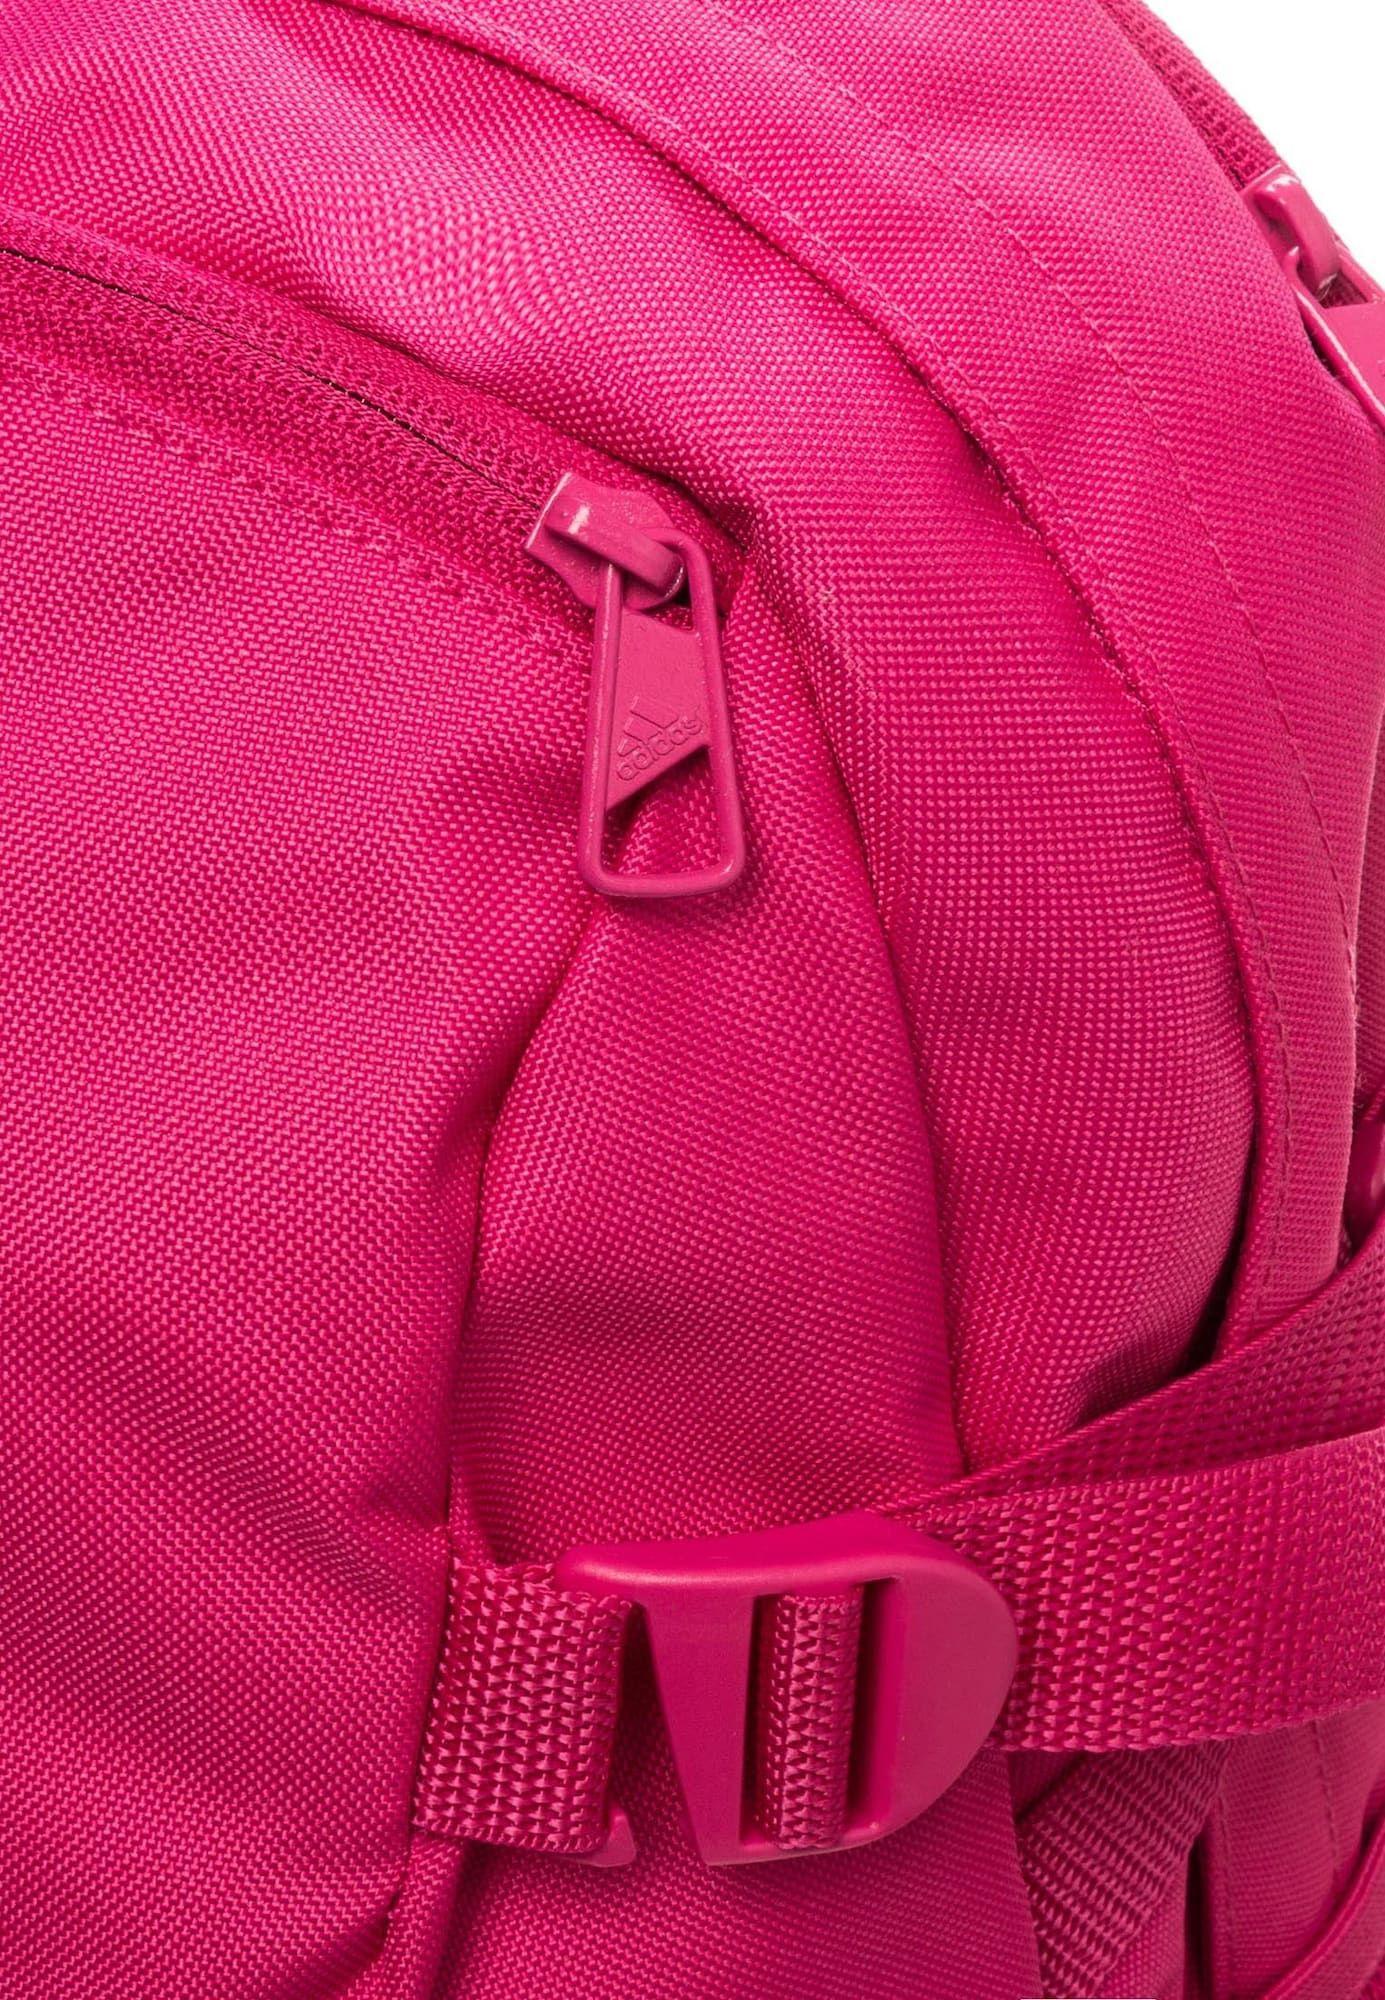 ADIDAS PERFORMANCE Sportrucksack 'Power IV' Herren, Pink